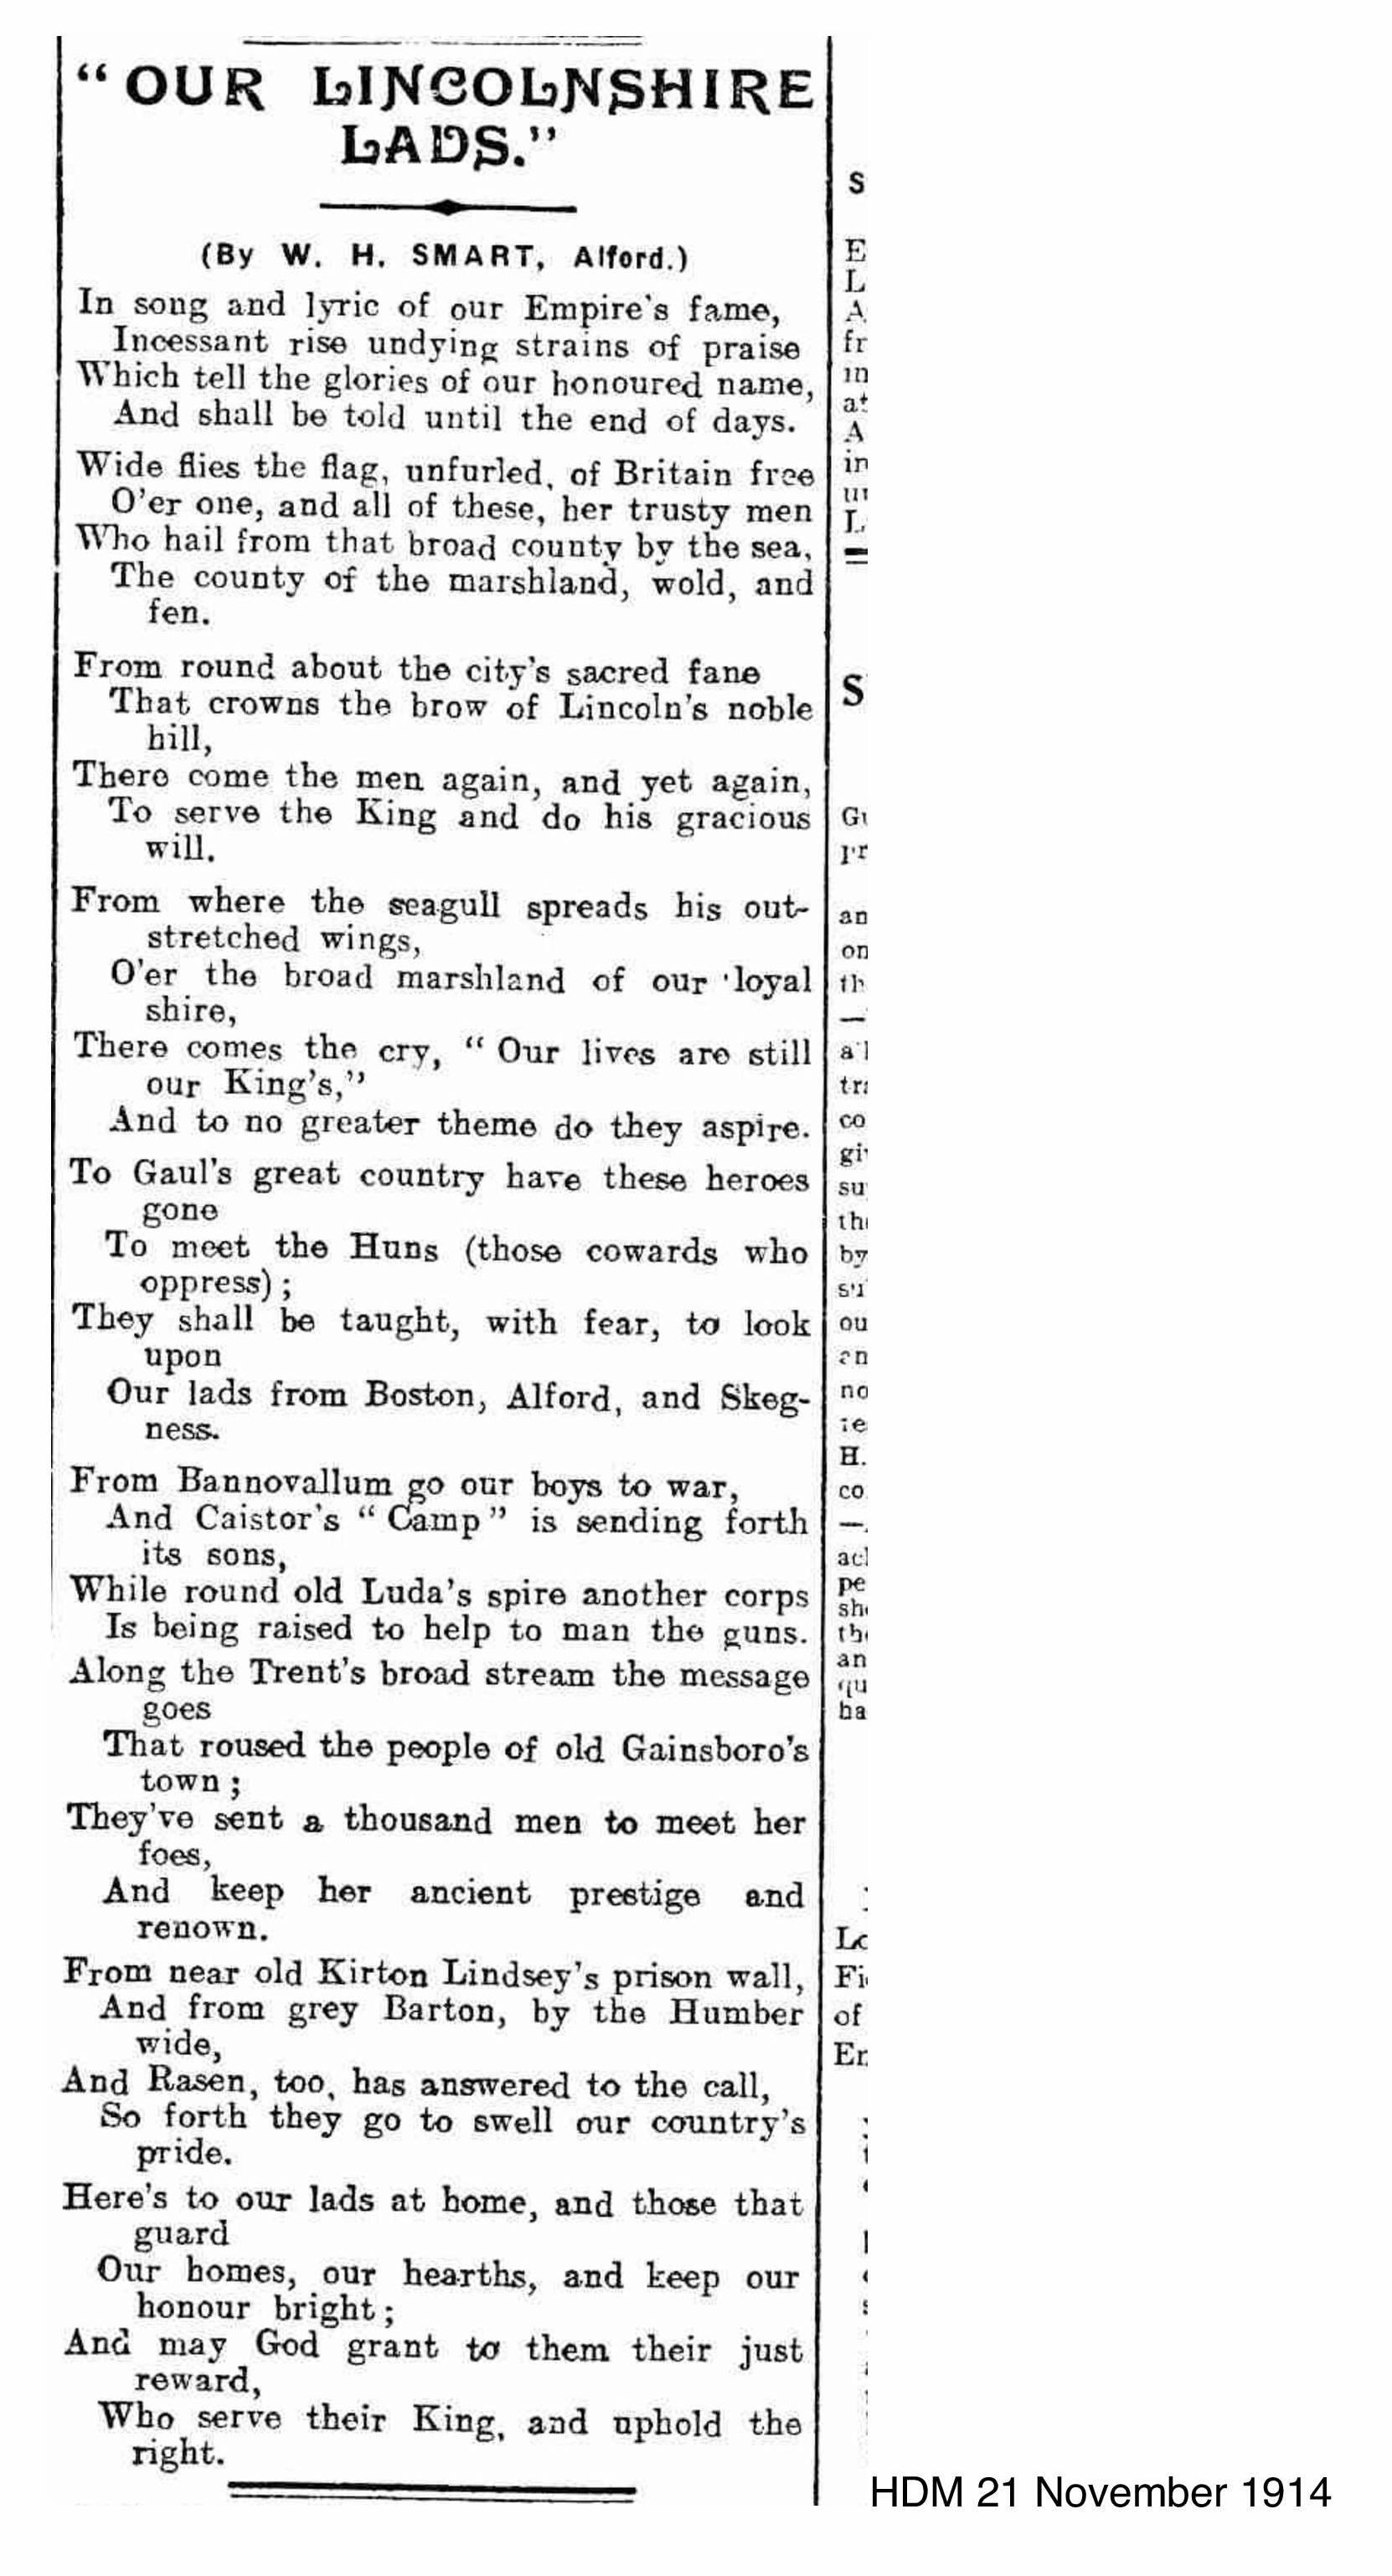 1914 Poem.jpg